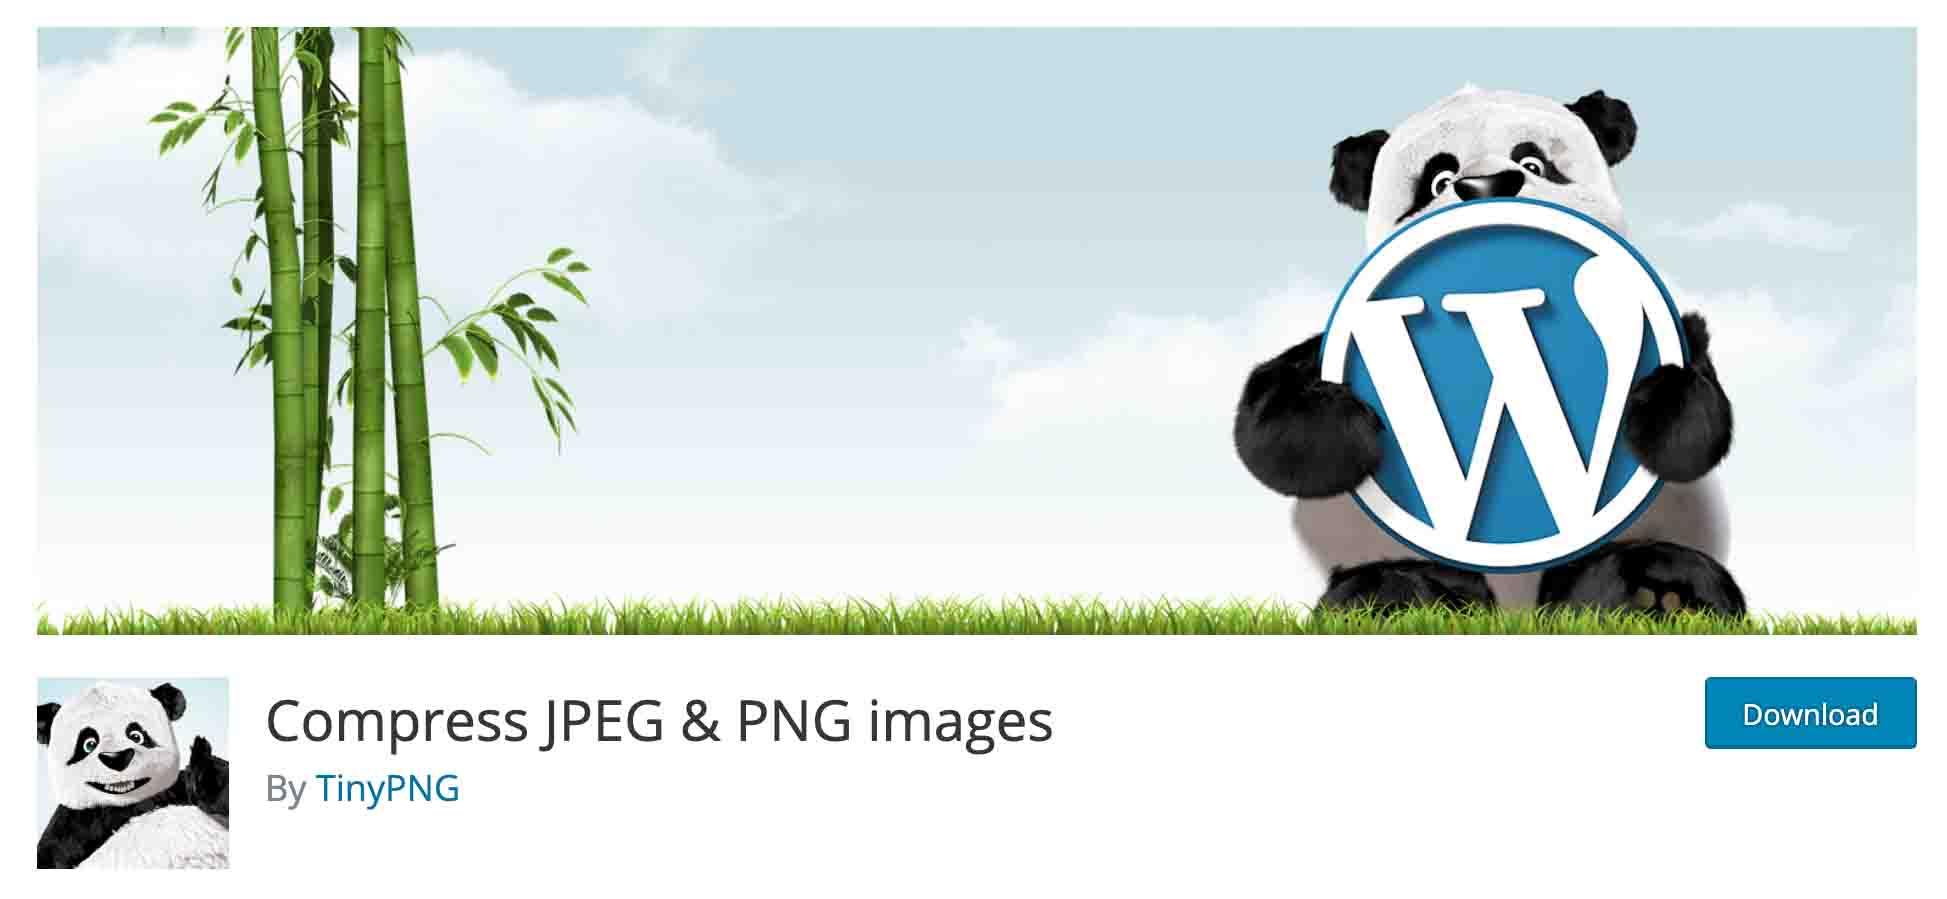 TinyPNG - WordPress Image Compression Plugins